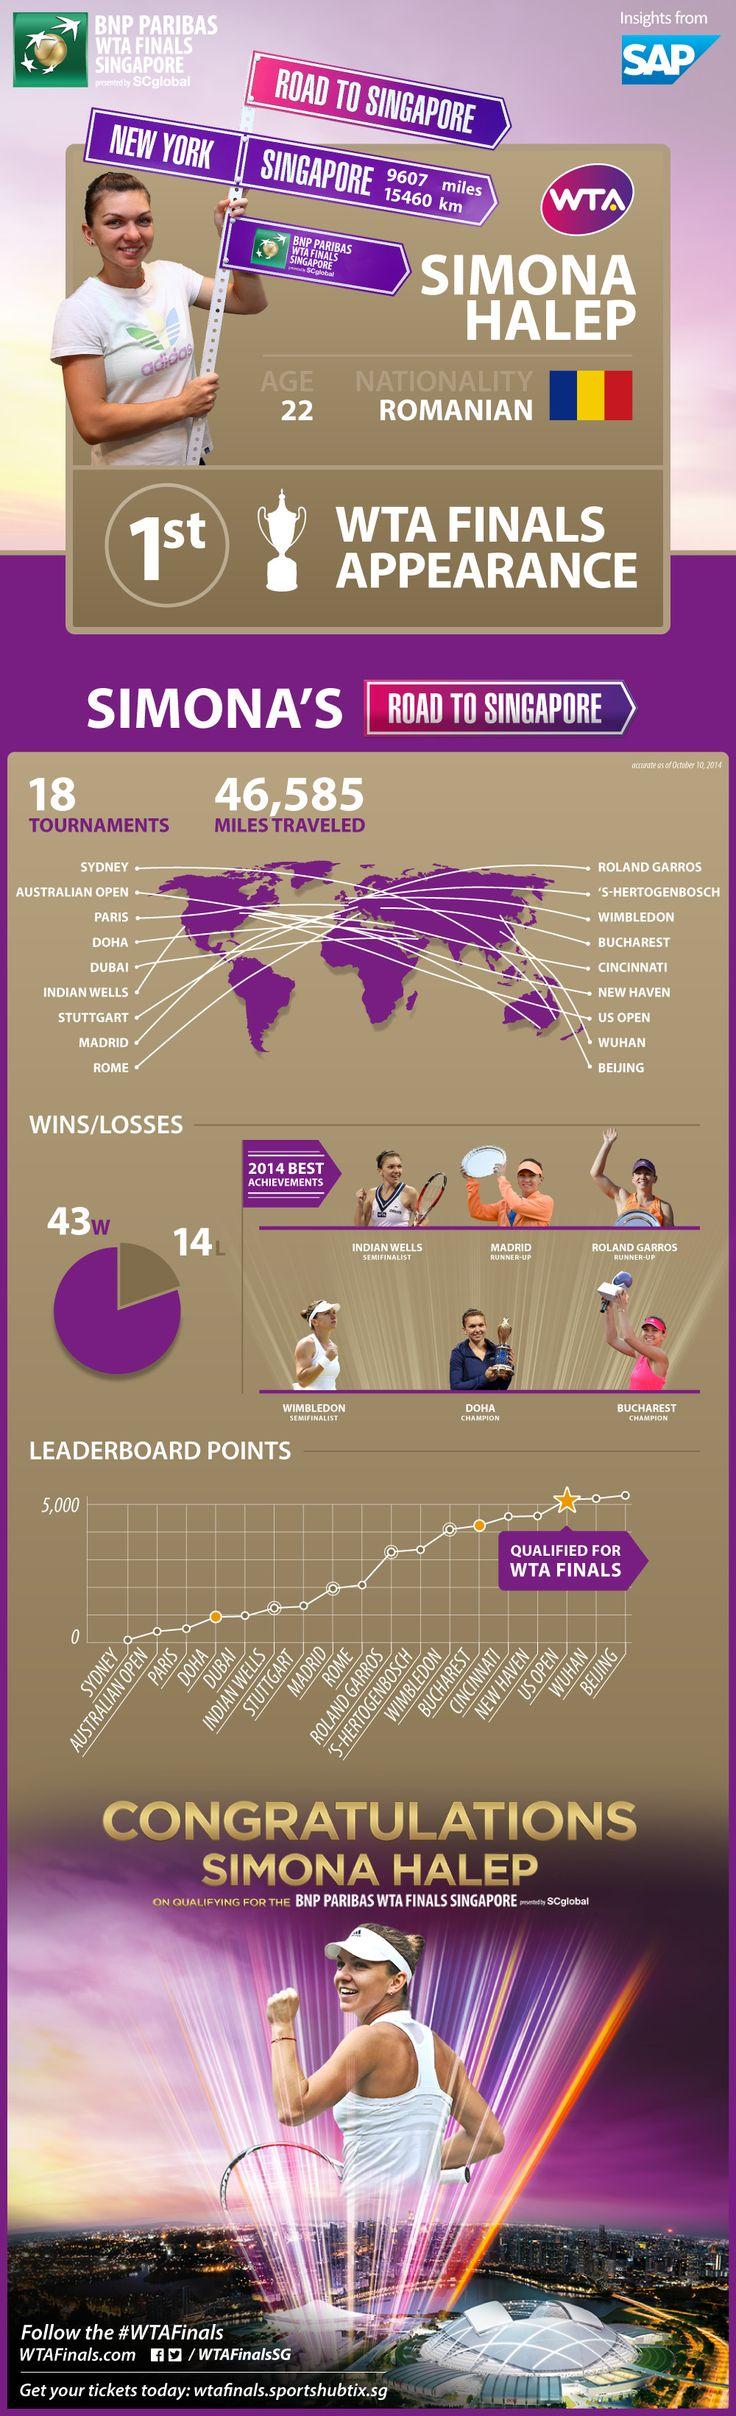 Simona Halep: Road to WTA Finals profile